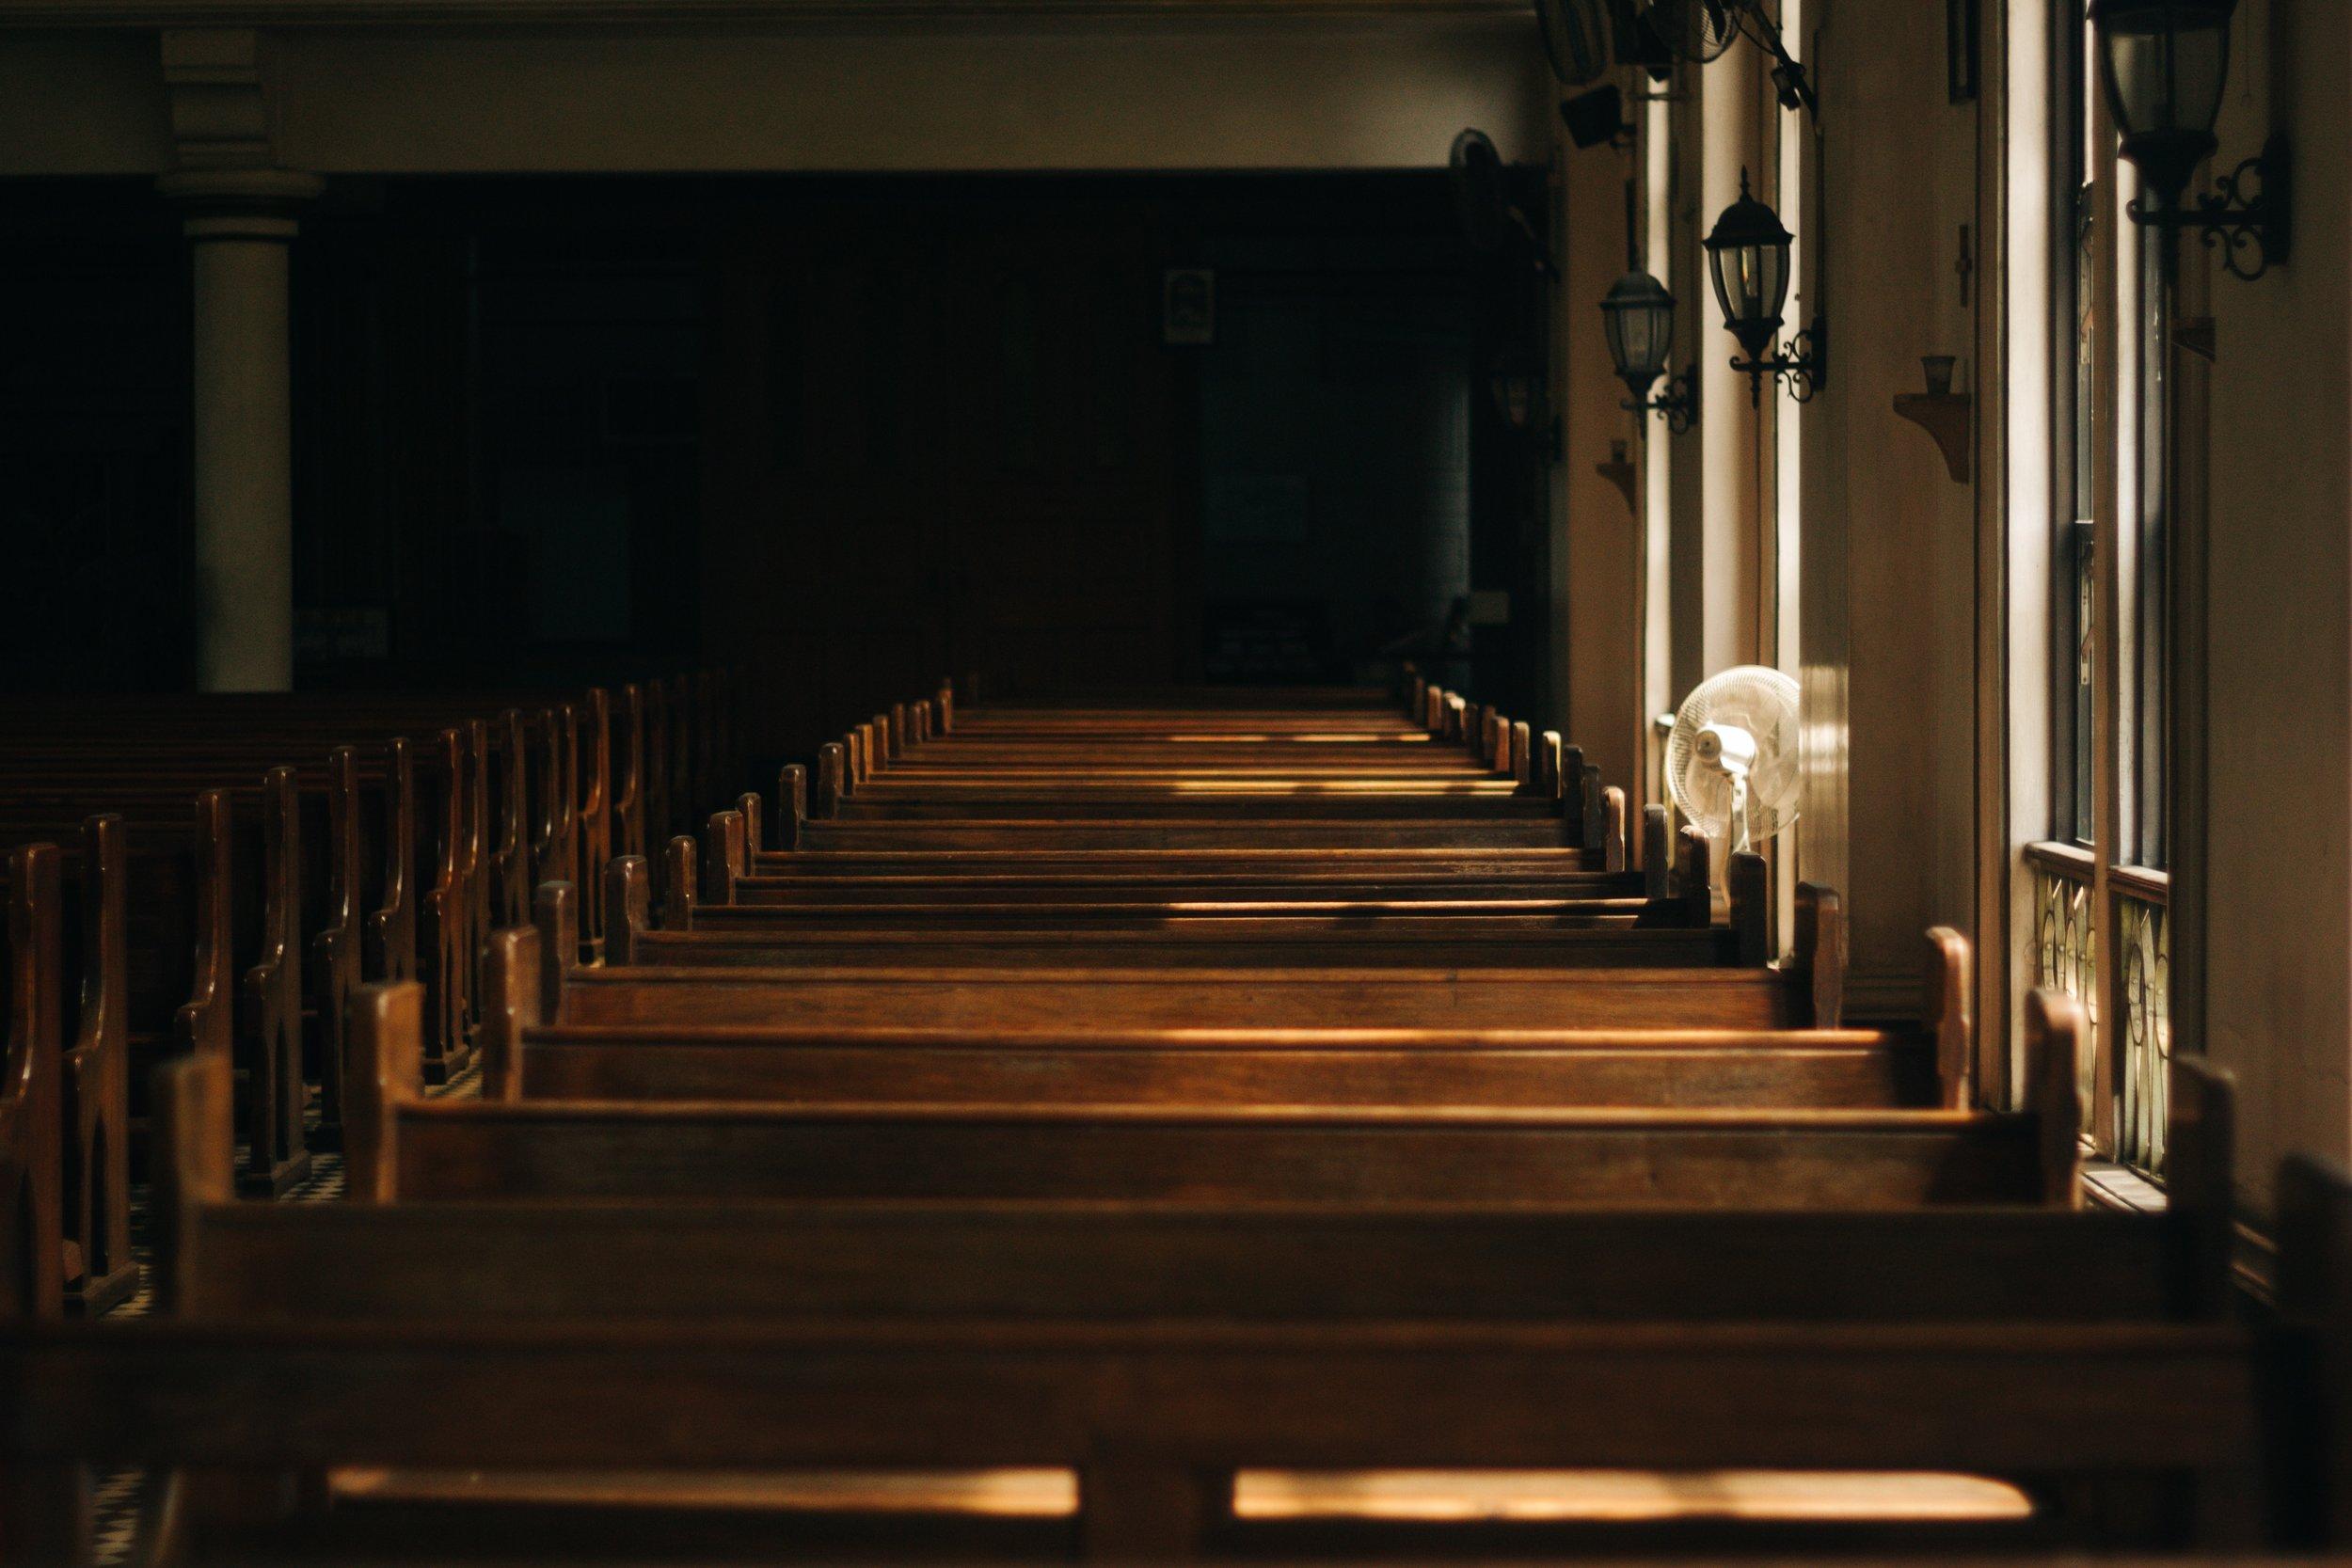 Empty Wooden Pews in Sanctuary